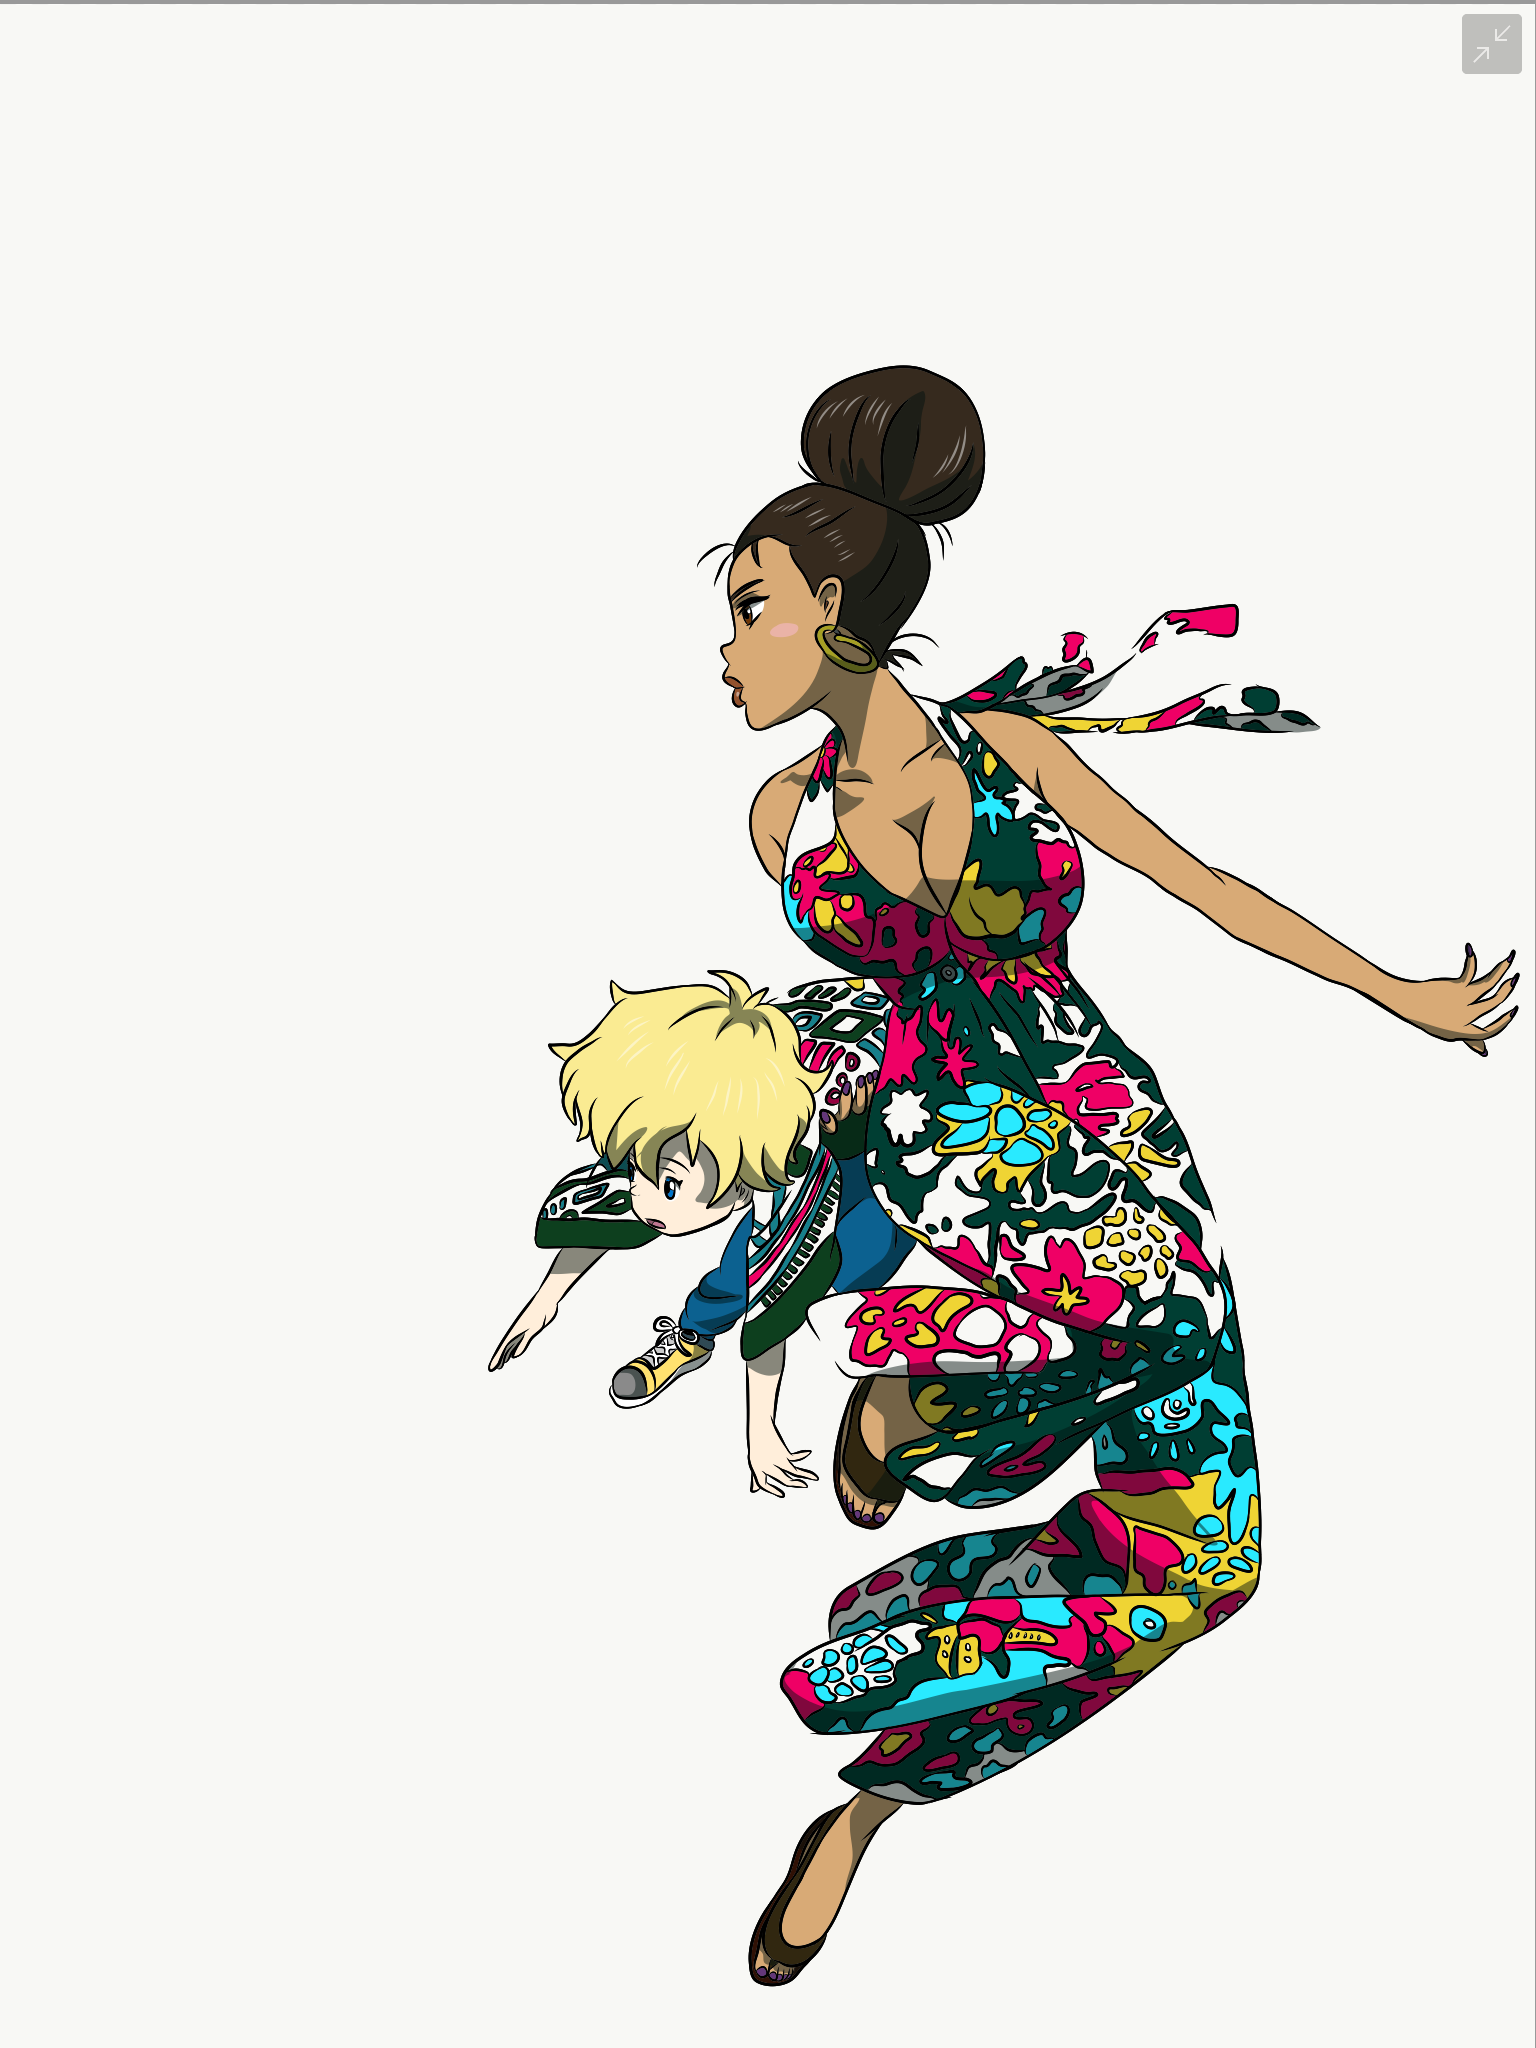 michiko-and-hatchin-pop-art-process-image-3.png